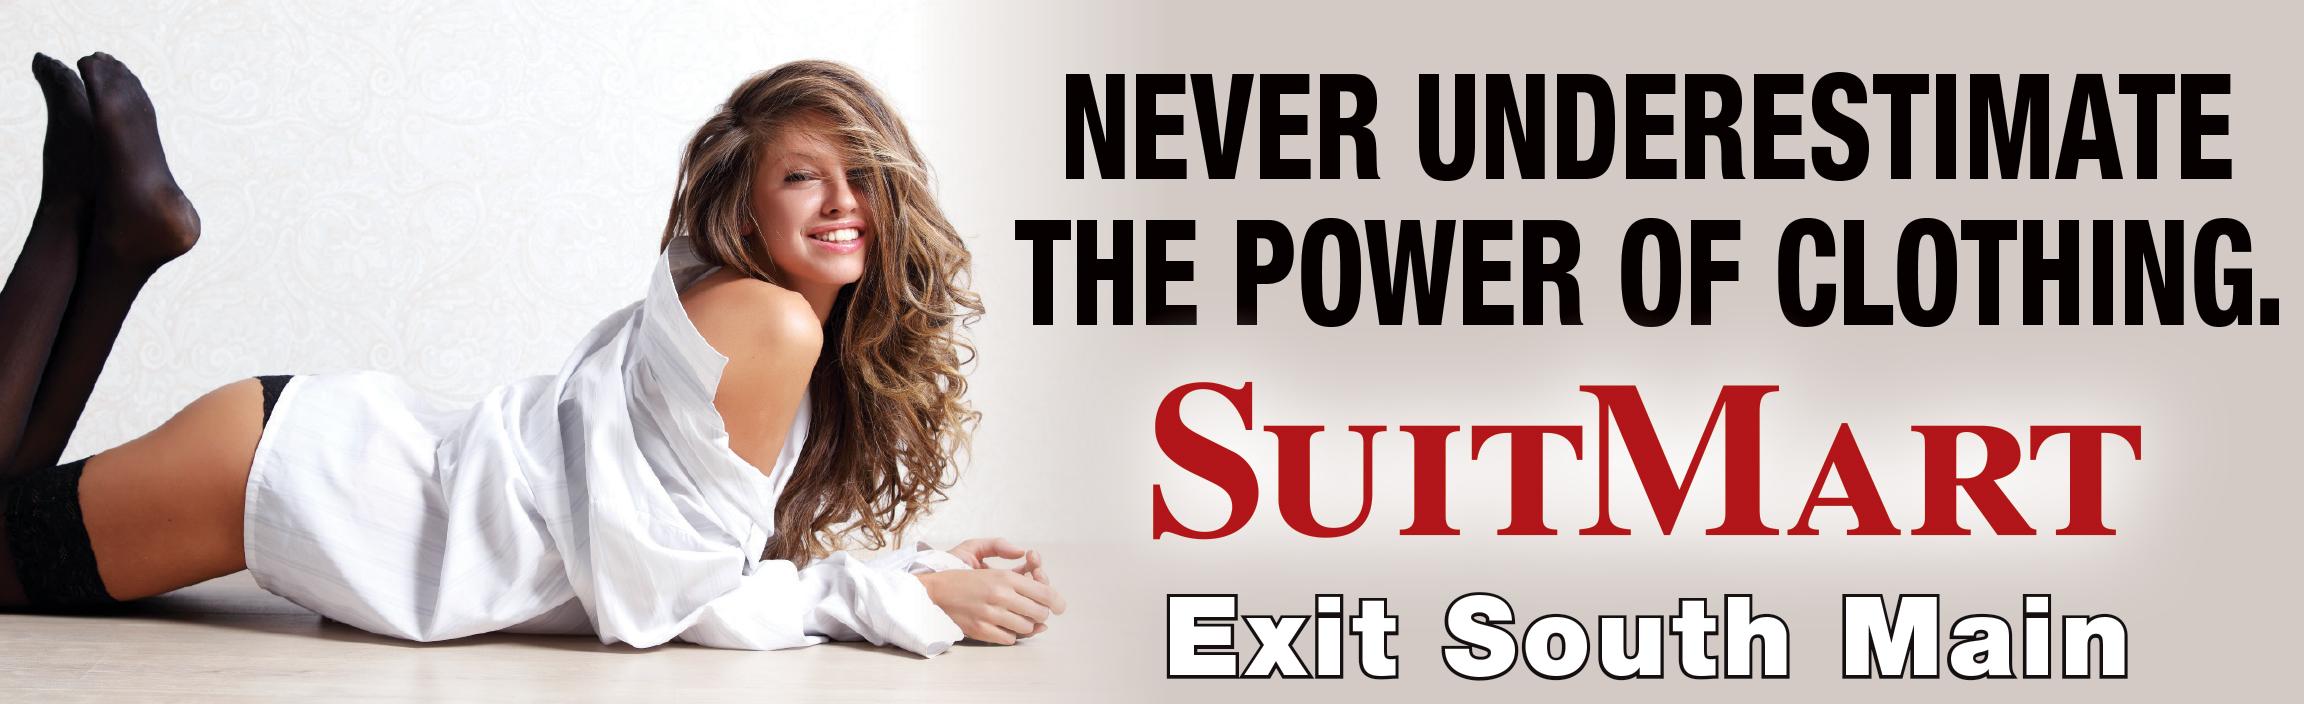 suitmart-billboard-2-final-REV.jpg